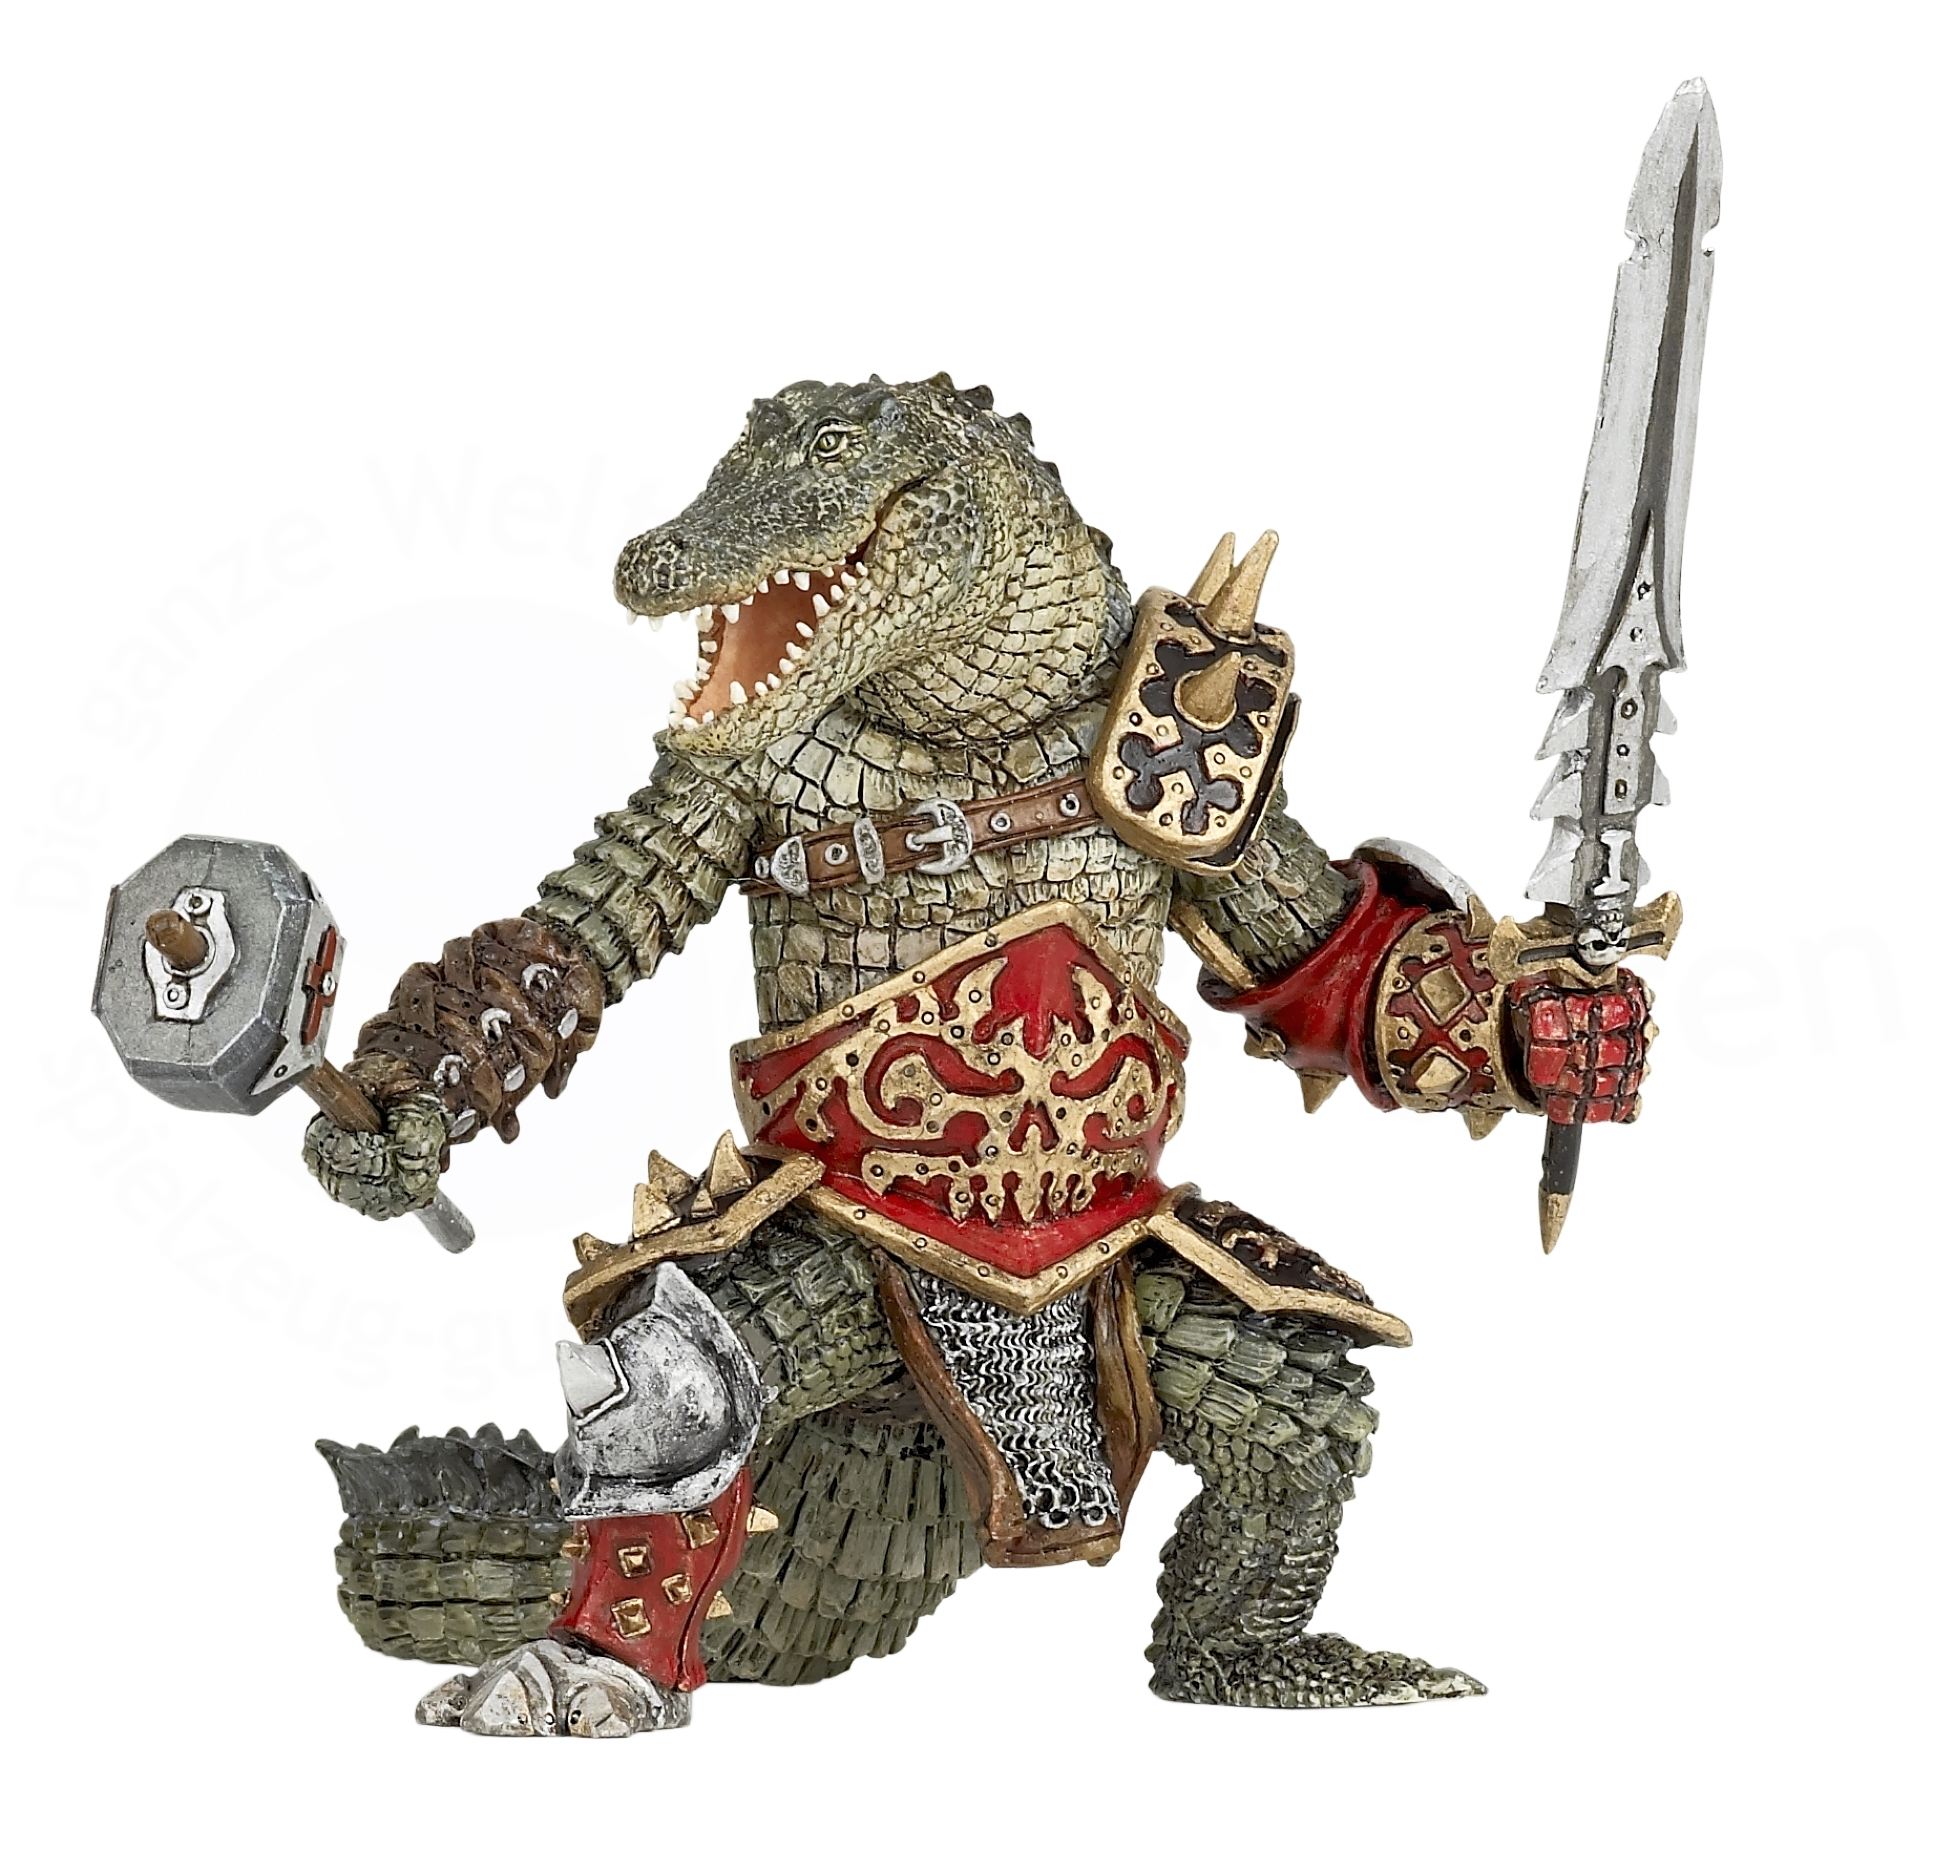 Человек-крокодил - Замки, рыцари, крепости, пираты, артикул: 82580